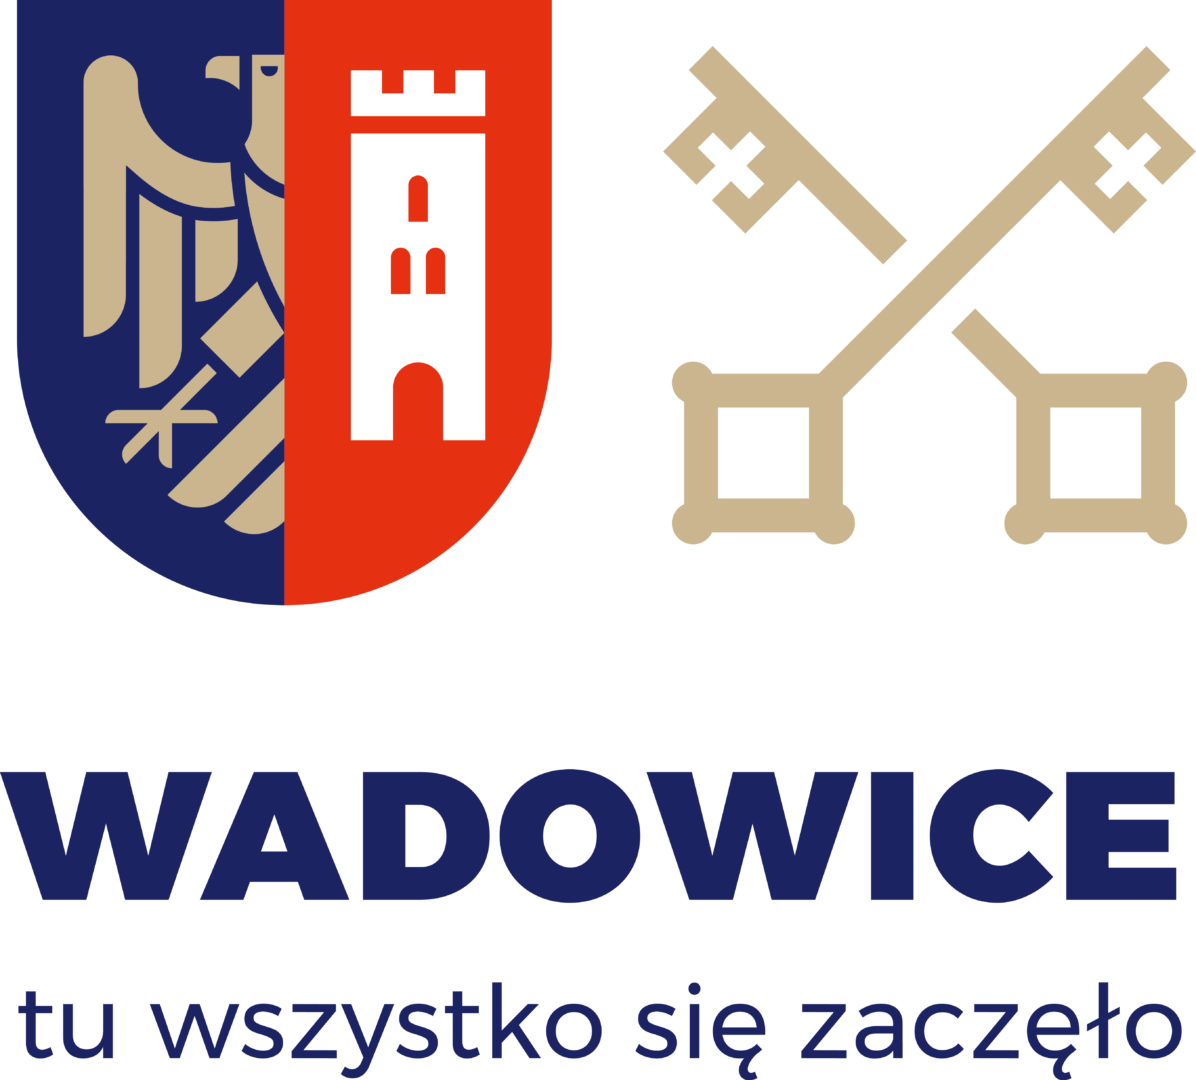 Logotypy do pobrania